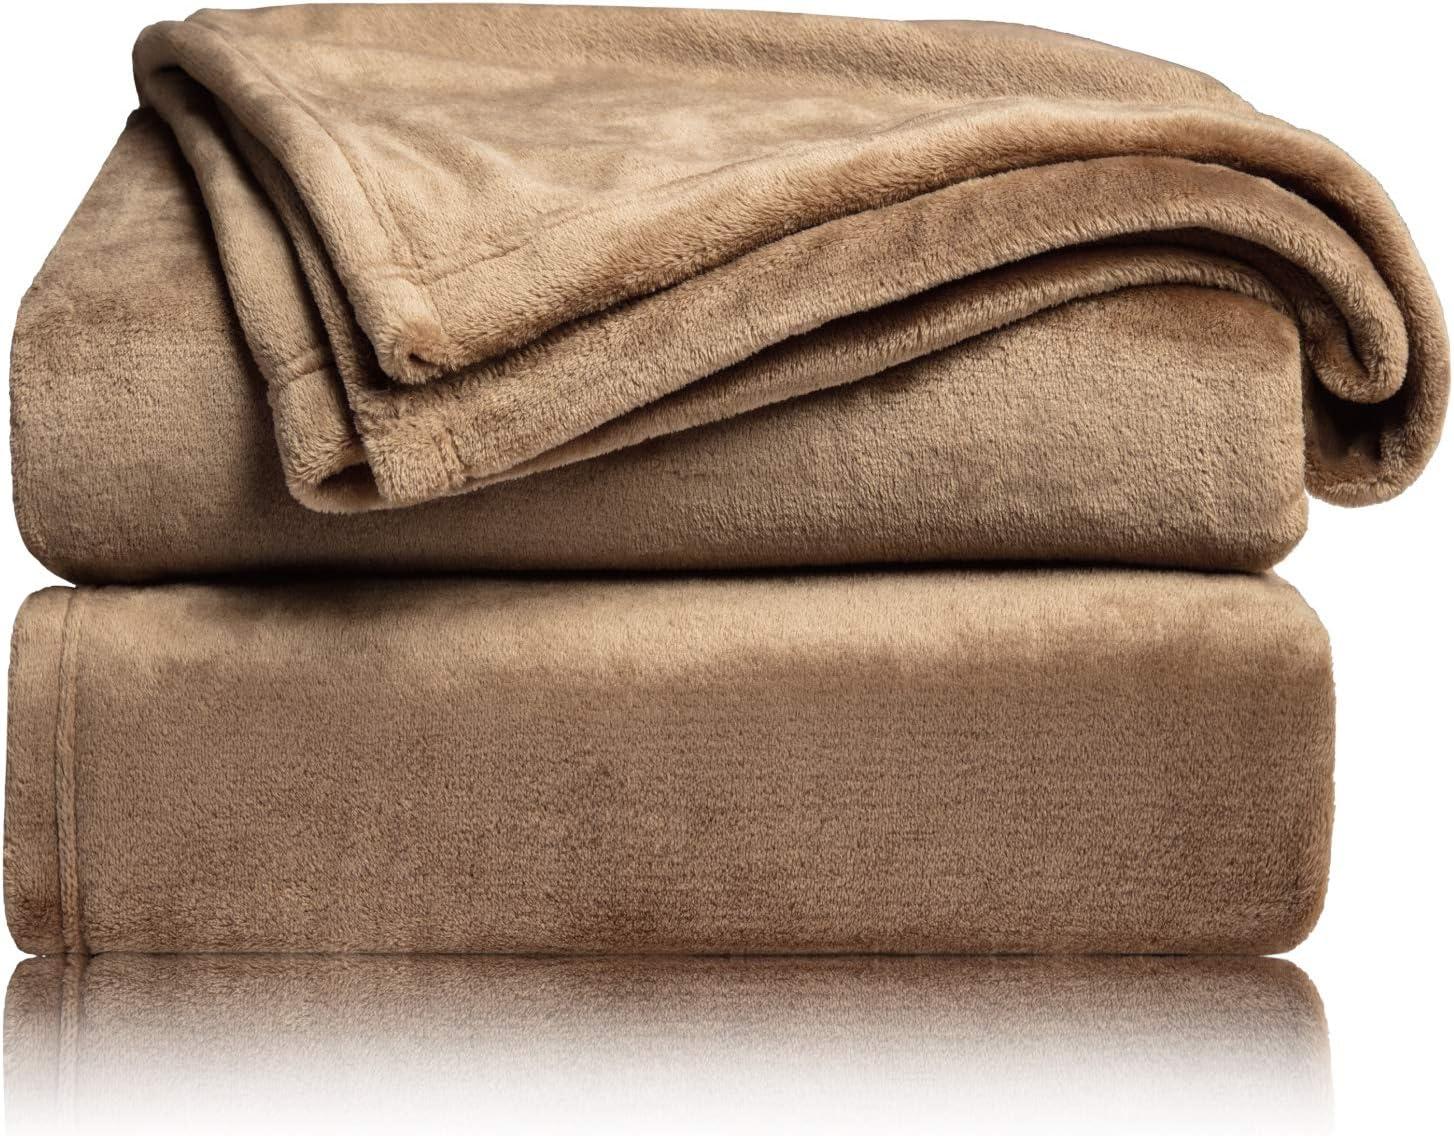 Bedsure Fleece Blanket Throw Size Taupe Lightweight Super Soft Cozy Camel Bed Blankets